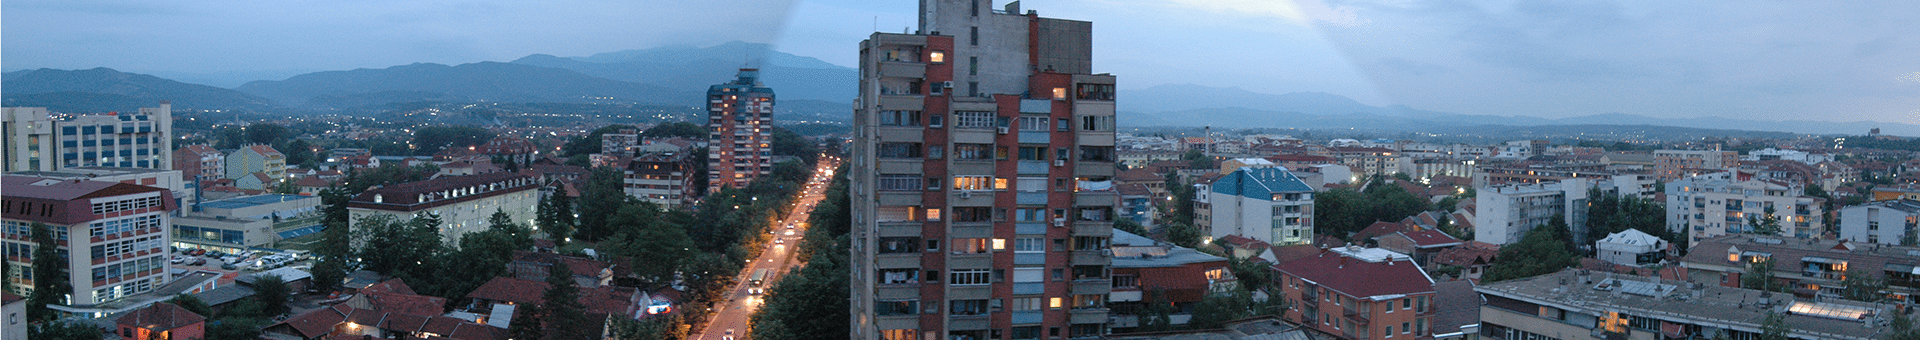 Grad Kraljevo